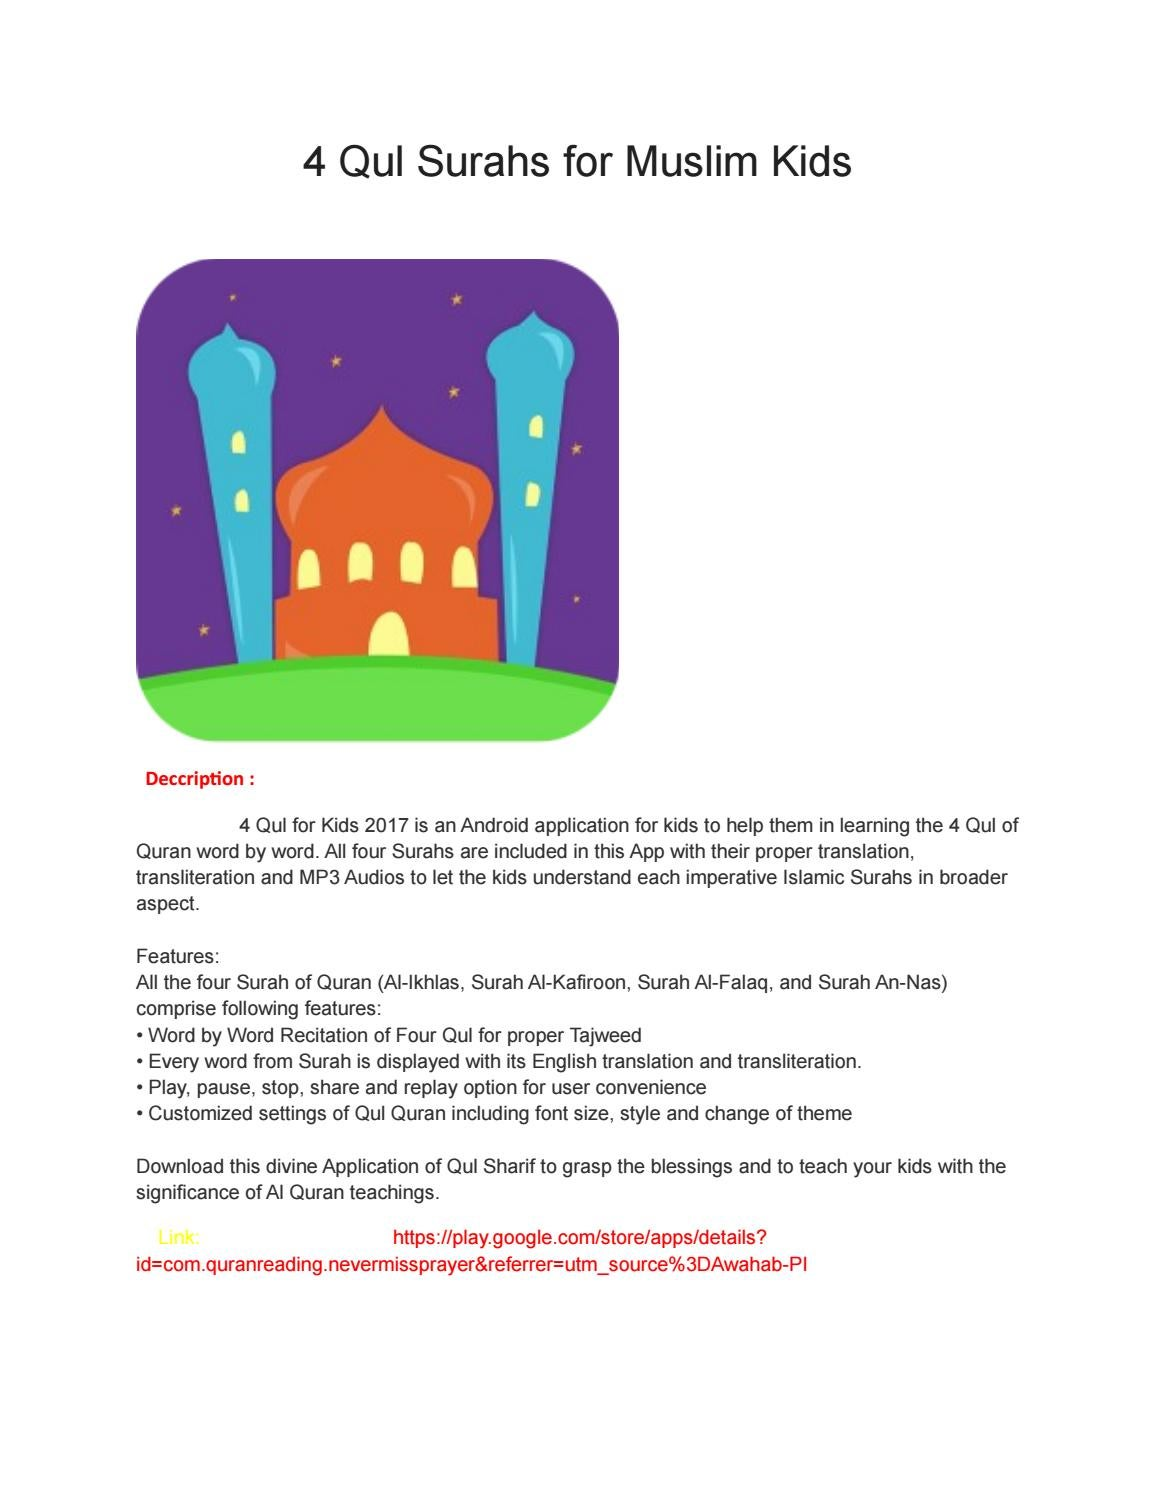 4 Qul Surahs for Muslim Kids by Rizwan Ali - issuu